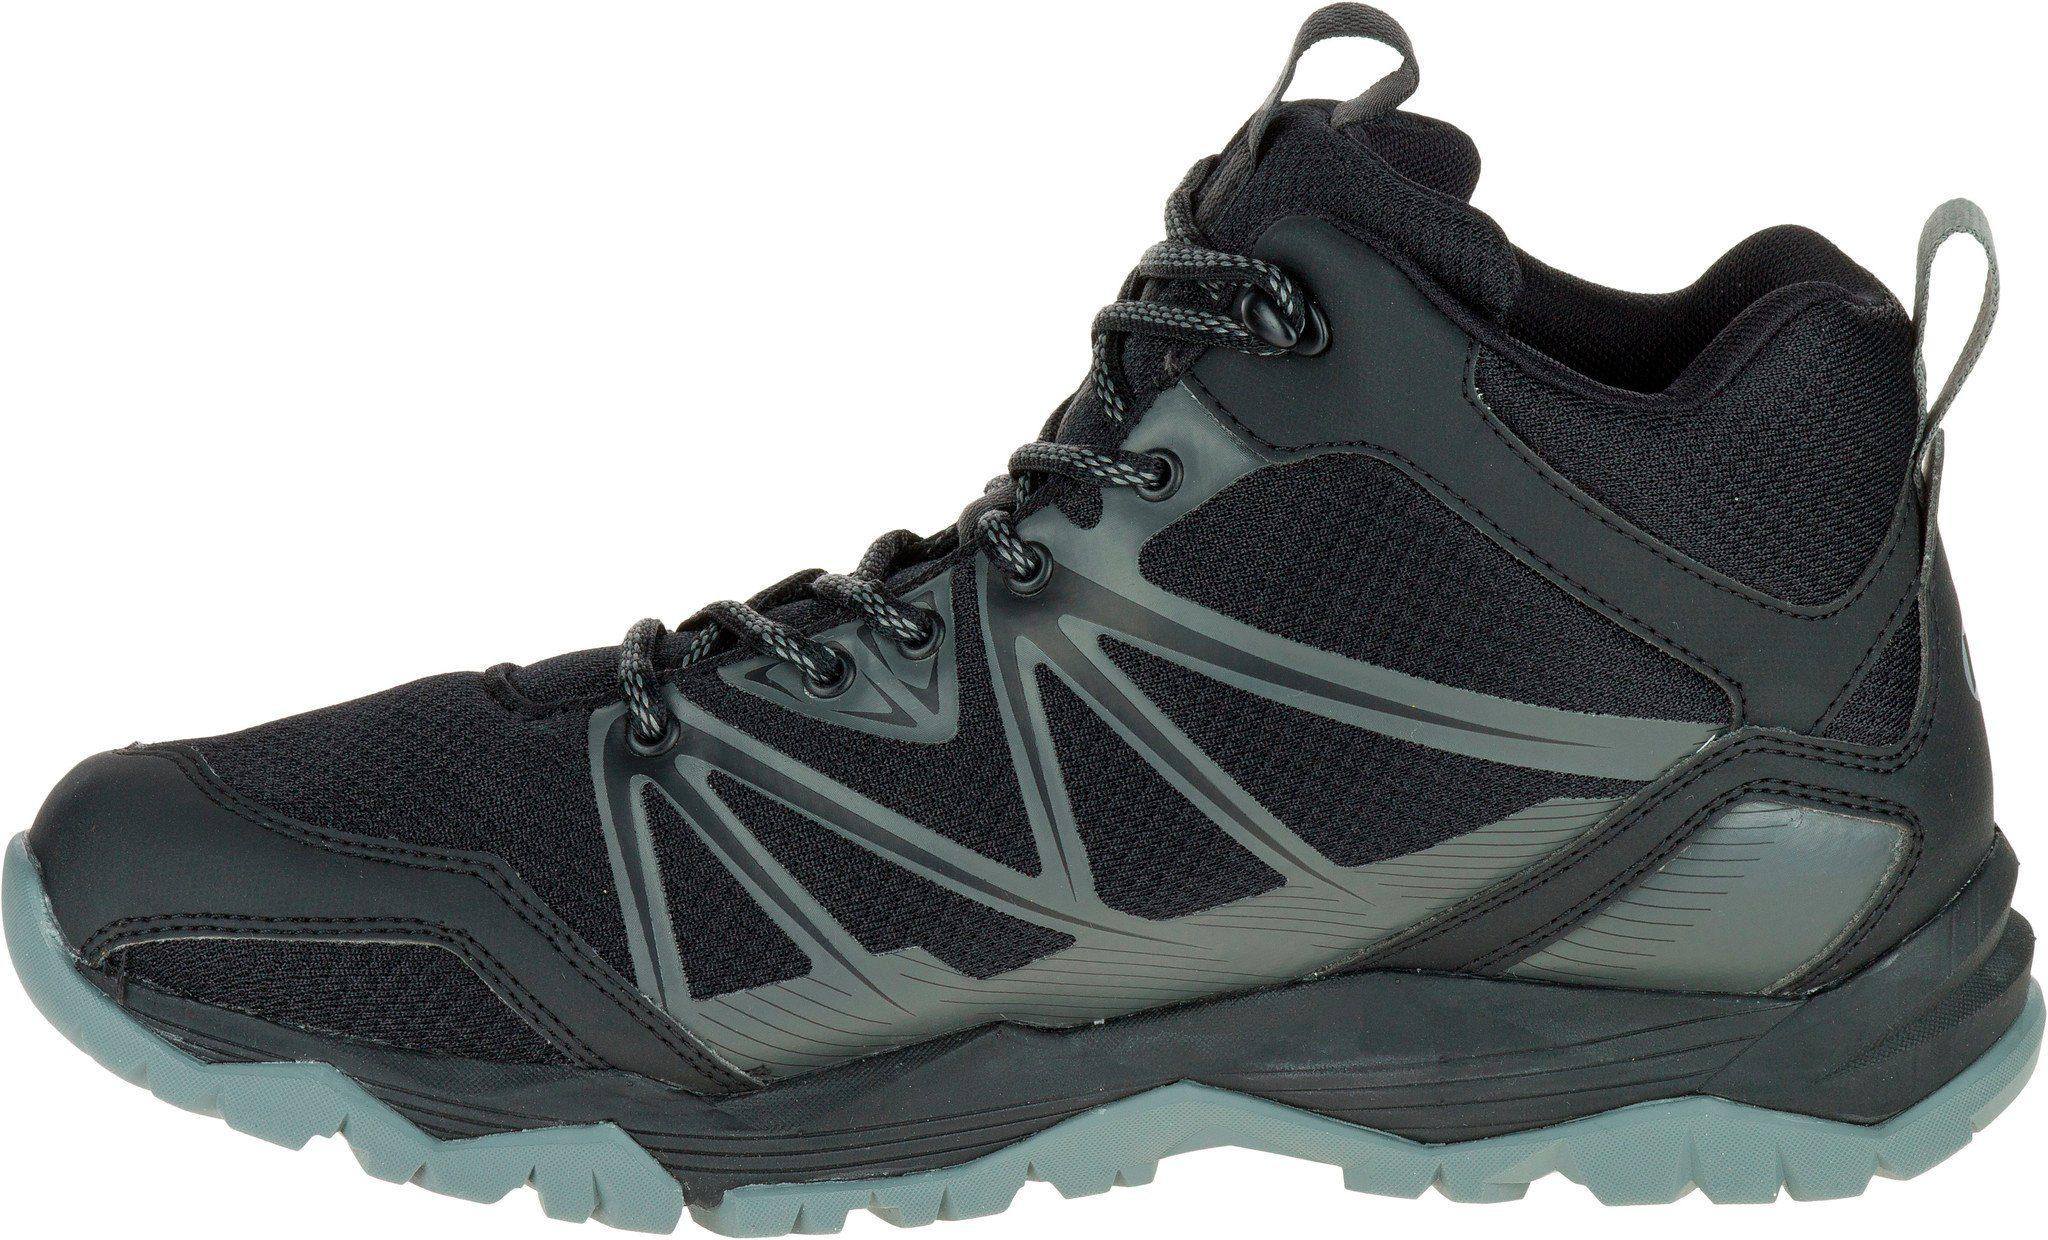 Merrell Kletterschuh »Capra Rise Mid Waterproof Shoes Men«